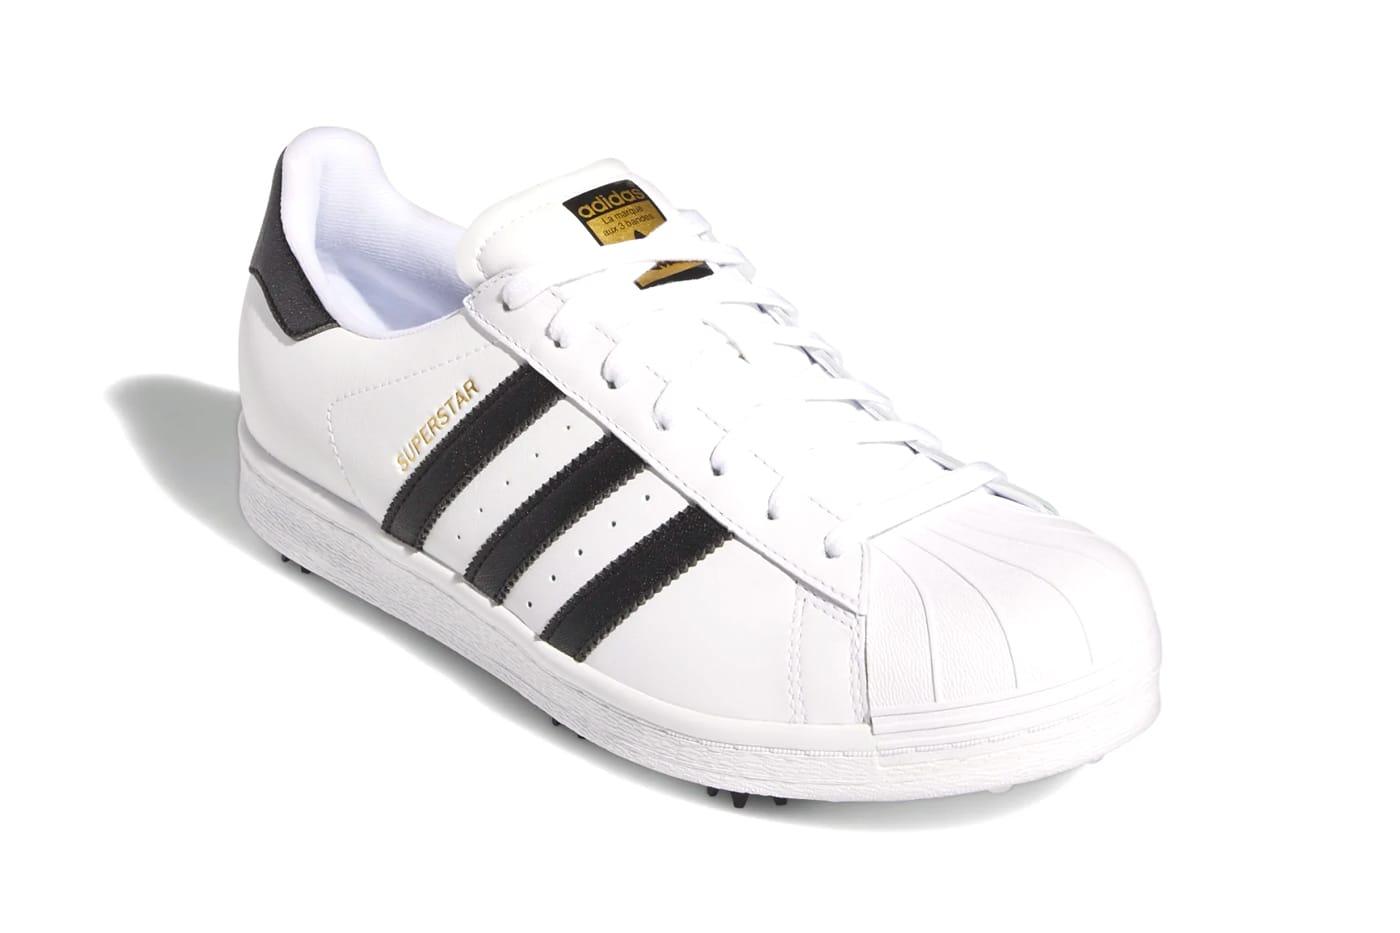 adidas Originals Superstar Golf Release